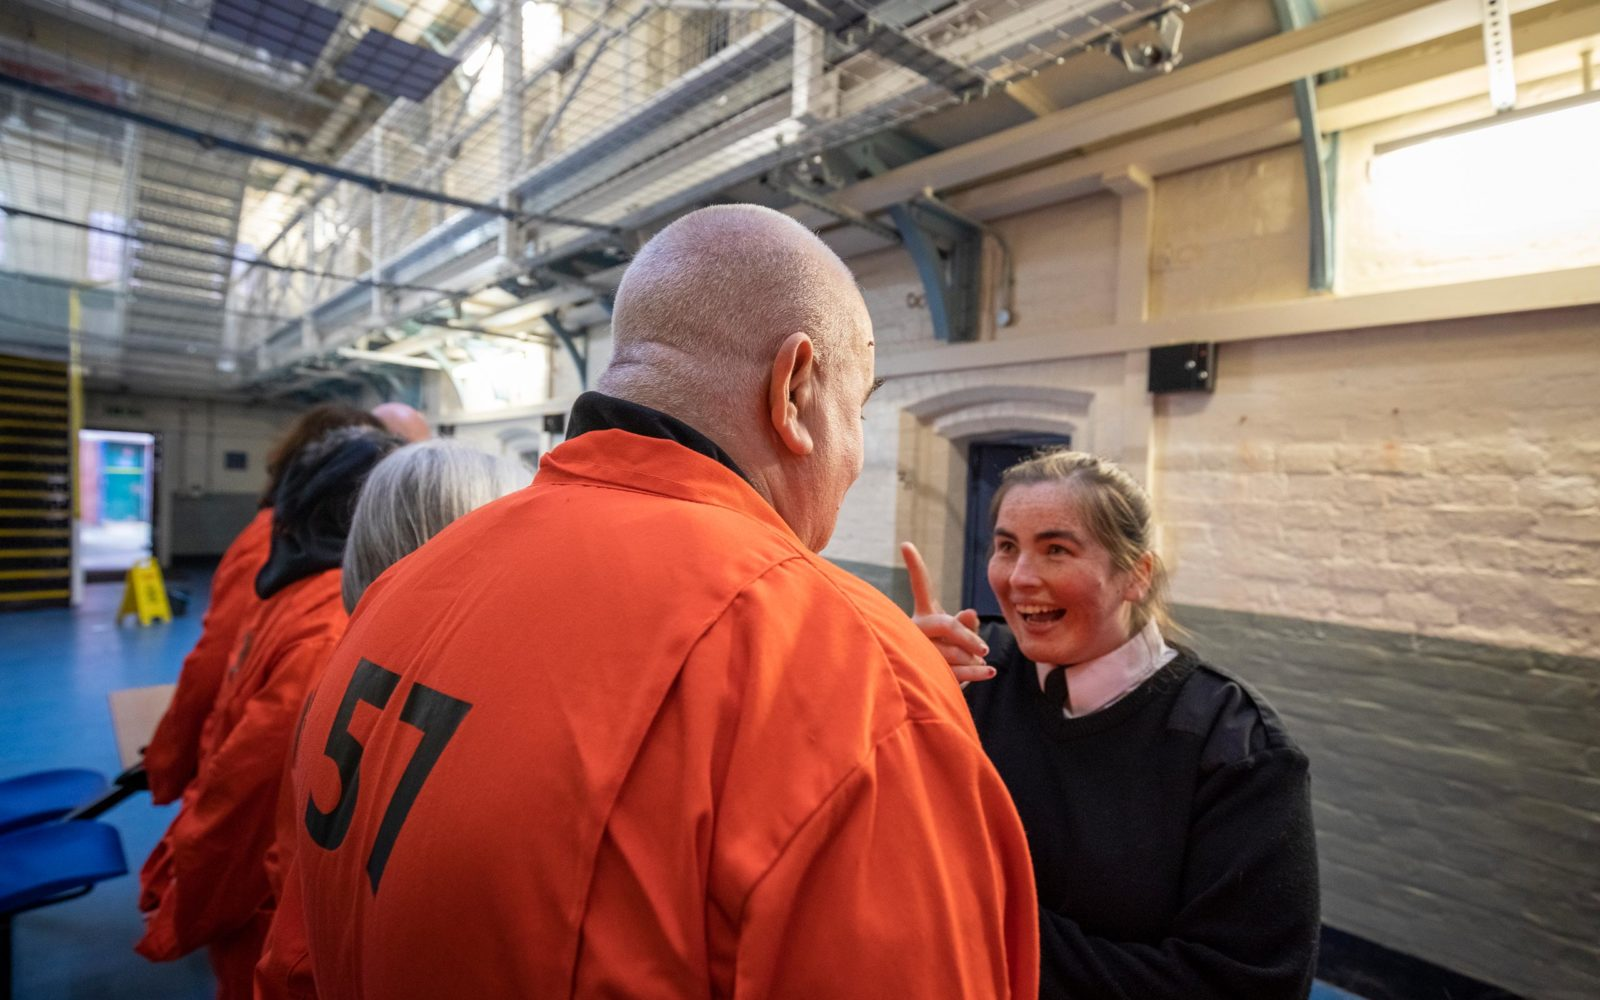 Shepton Mallet Prison Corporate Events